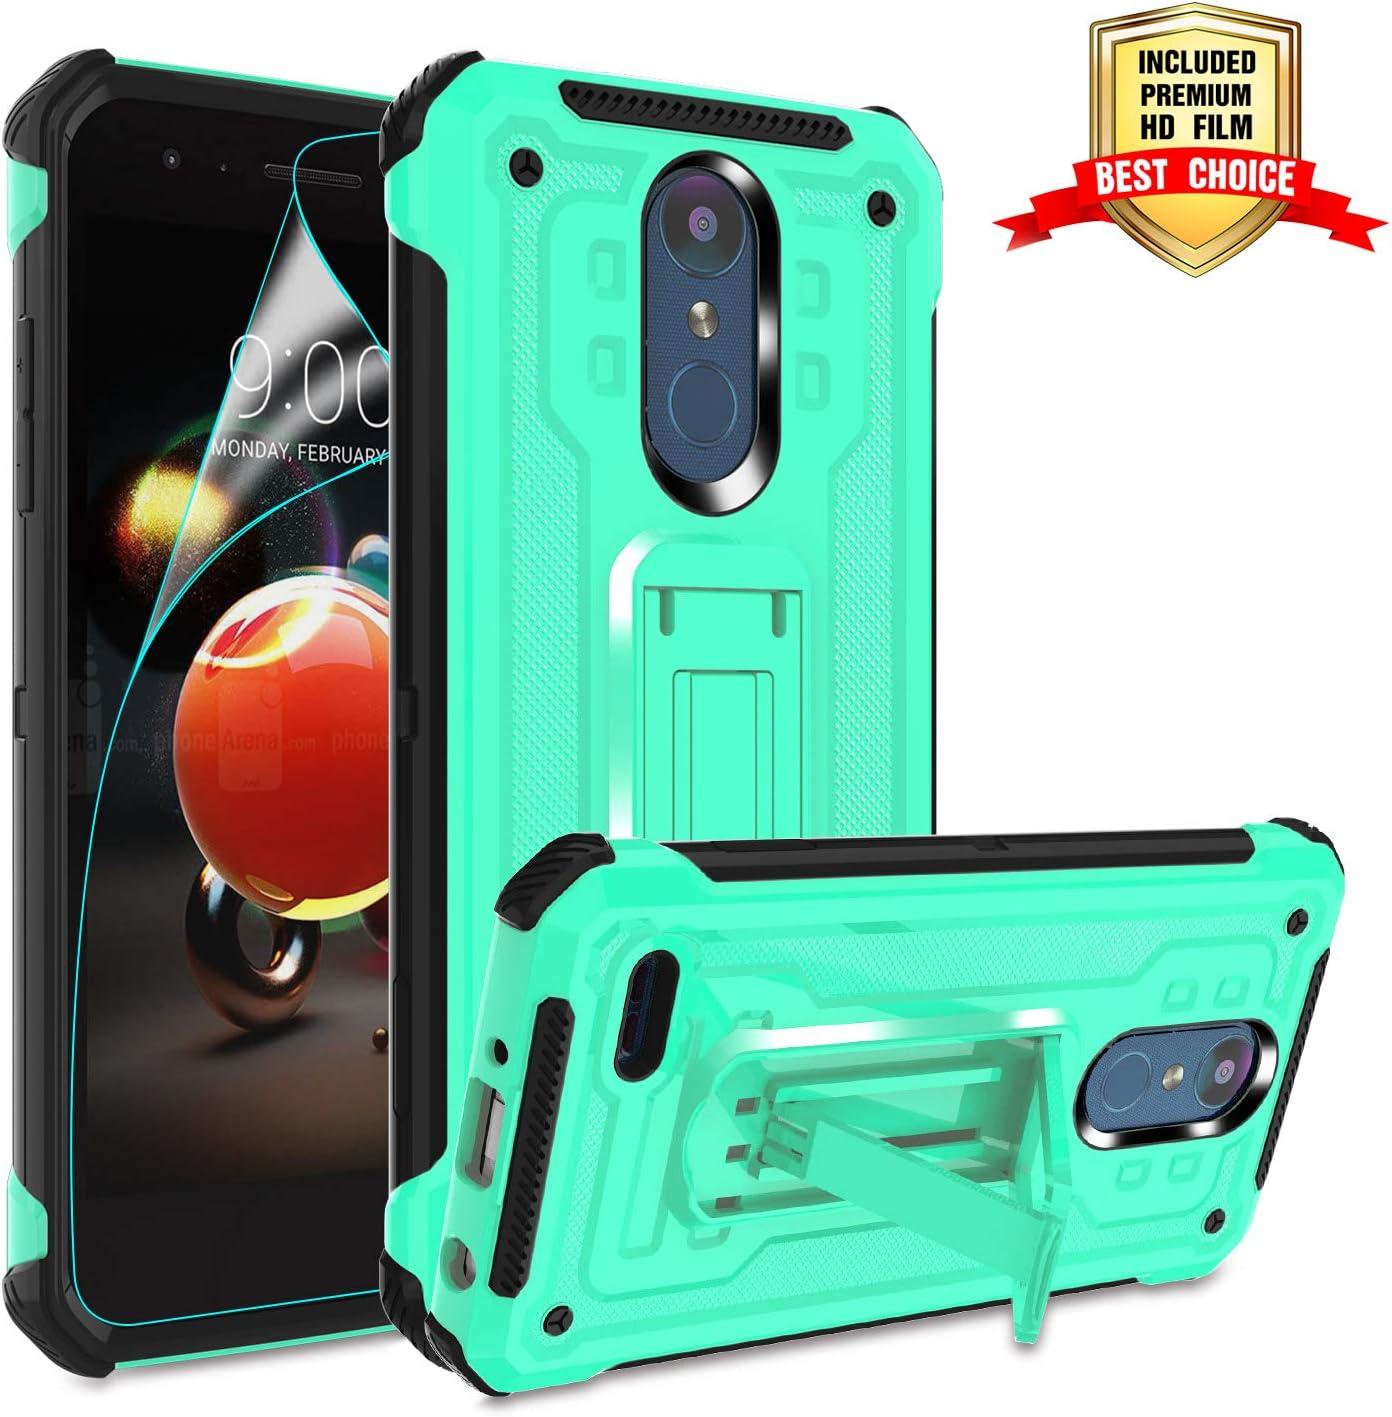 LG Aristo 2 Case,LG Aristo 3/Rebel 4 LTE/Tribute Empire/Dynasty/Fortune 2/Phoenix 4/ Aristo 2 Plus/Zone 4/Risio 3/K8+/LG K8S Phone Case with Kickstand, Atump Military Grade for LG K8 2018 Mint